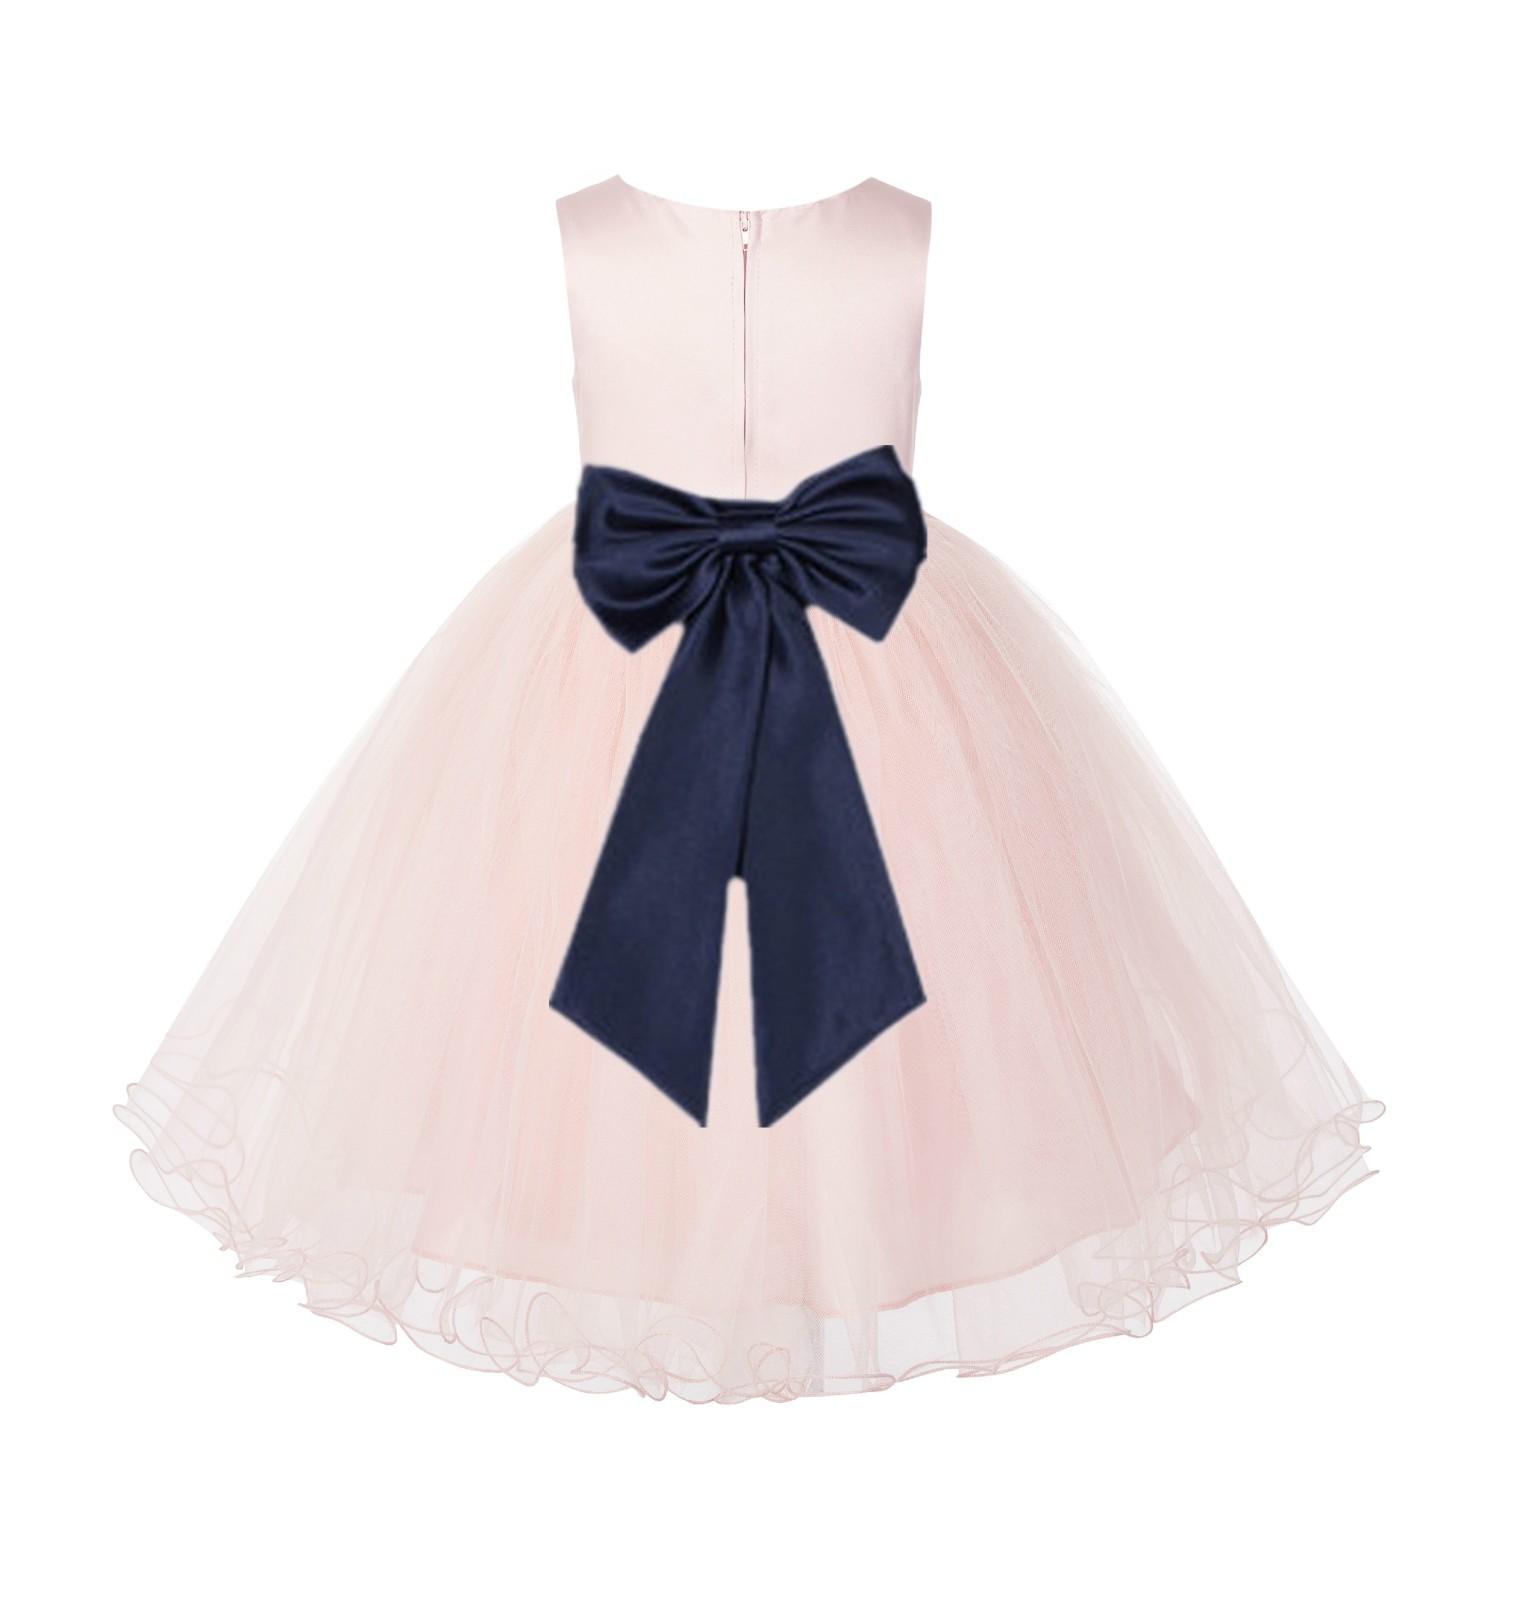 Blush PInk / Midnight Tulle Rattail Edge Flower Girl Dress Wedding Bridesmaid 829T